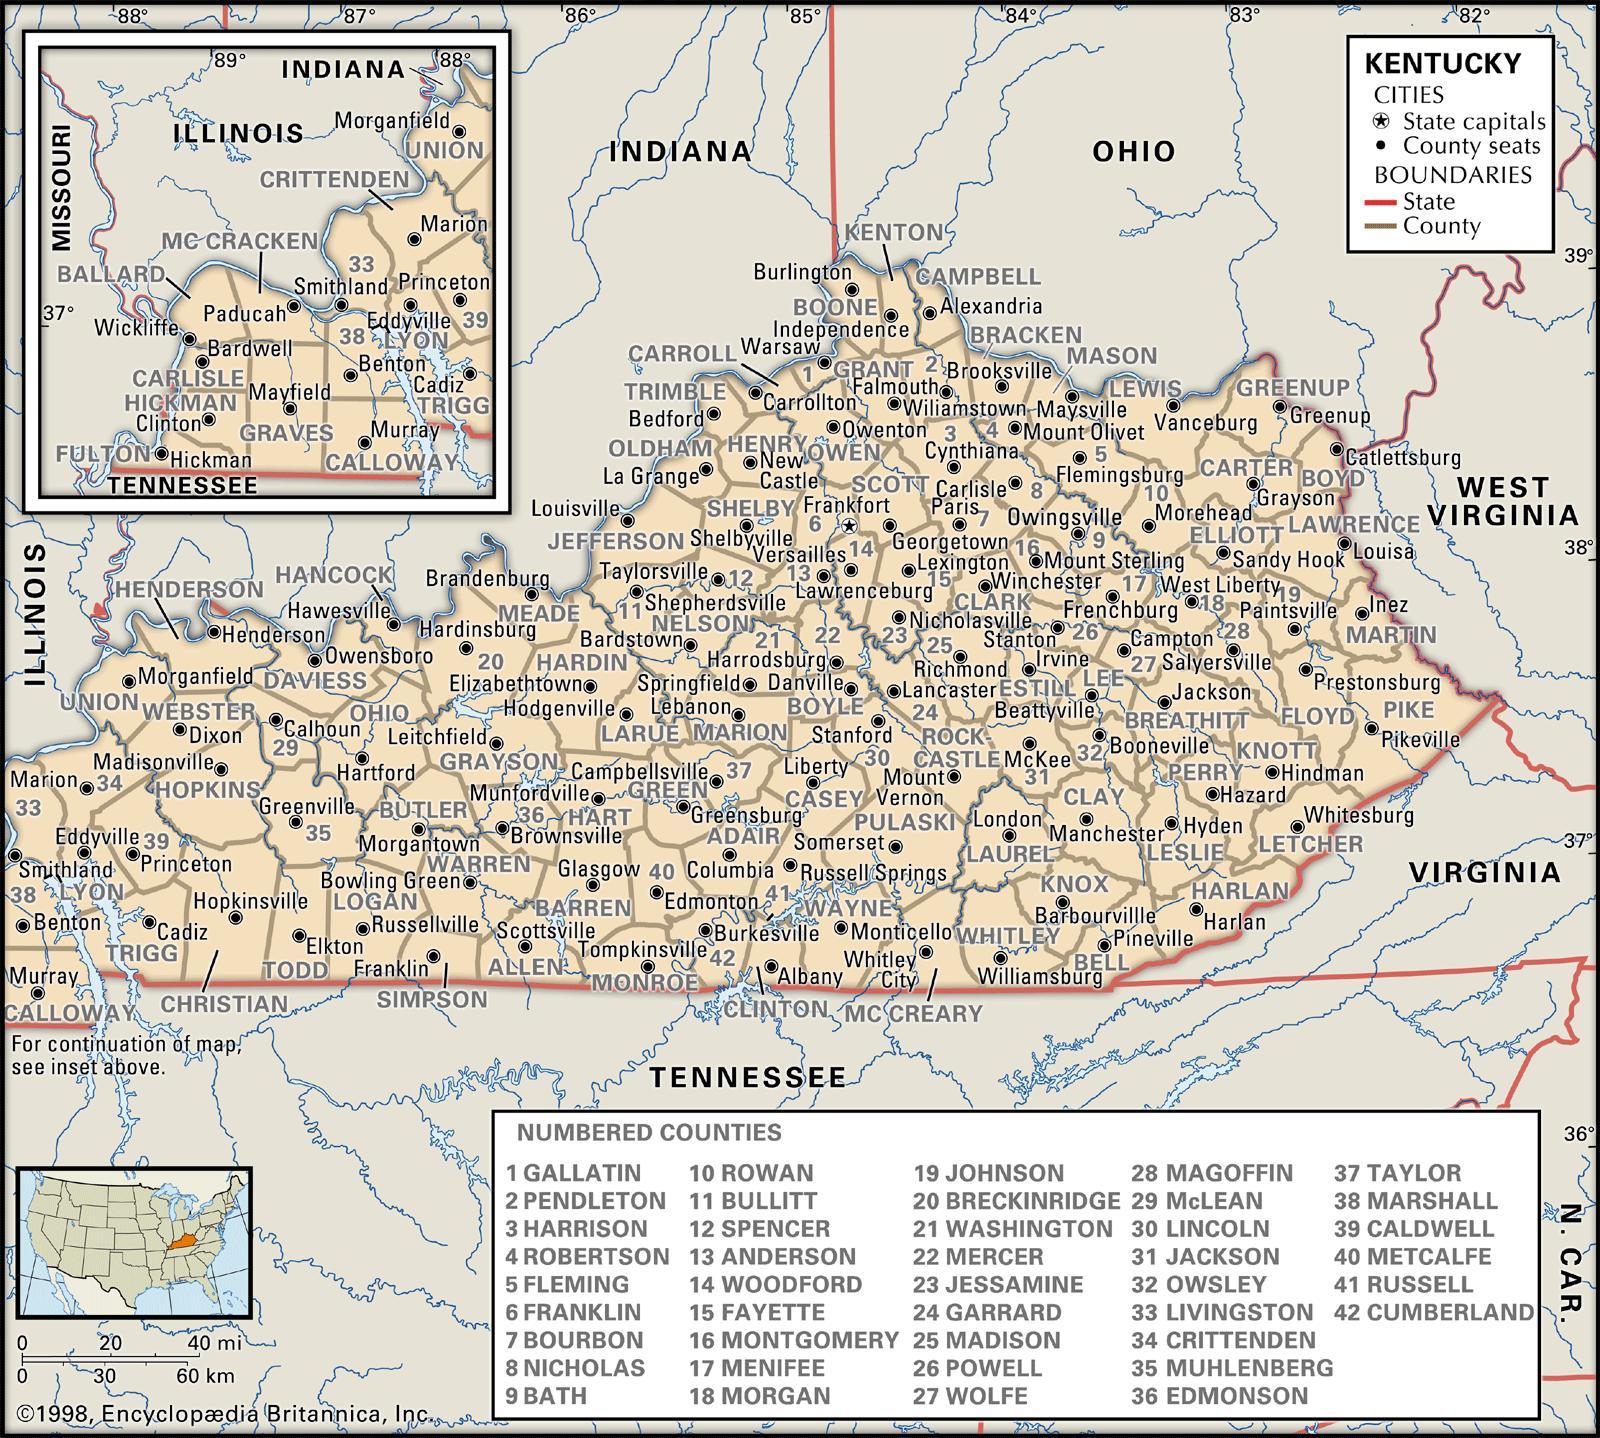 Kentucky lata map